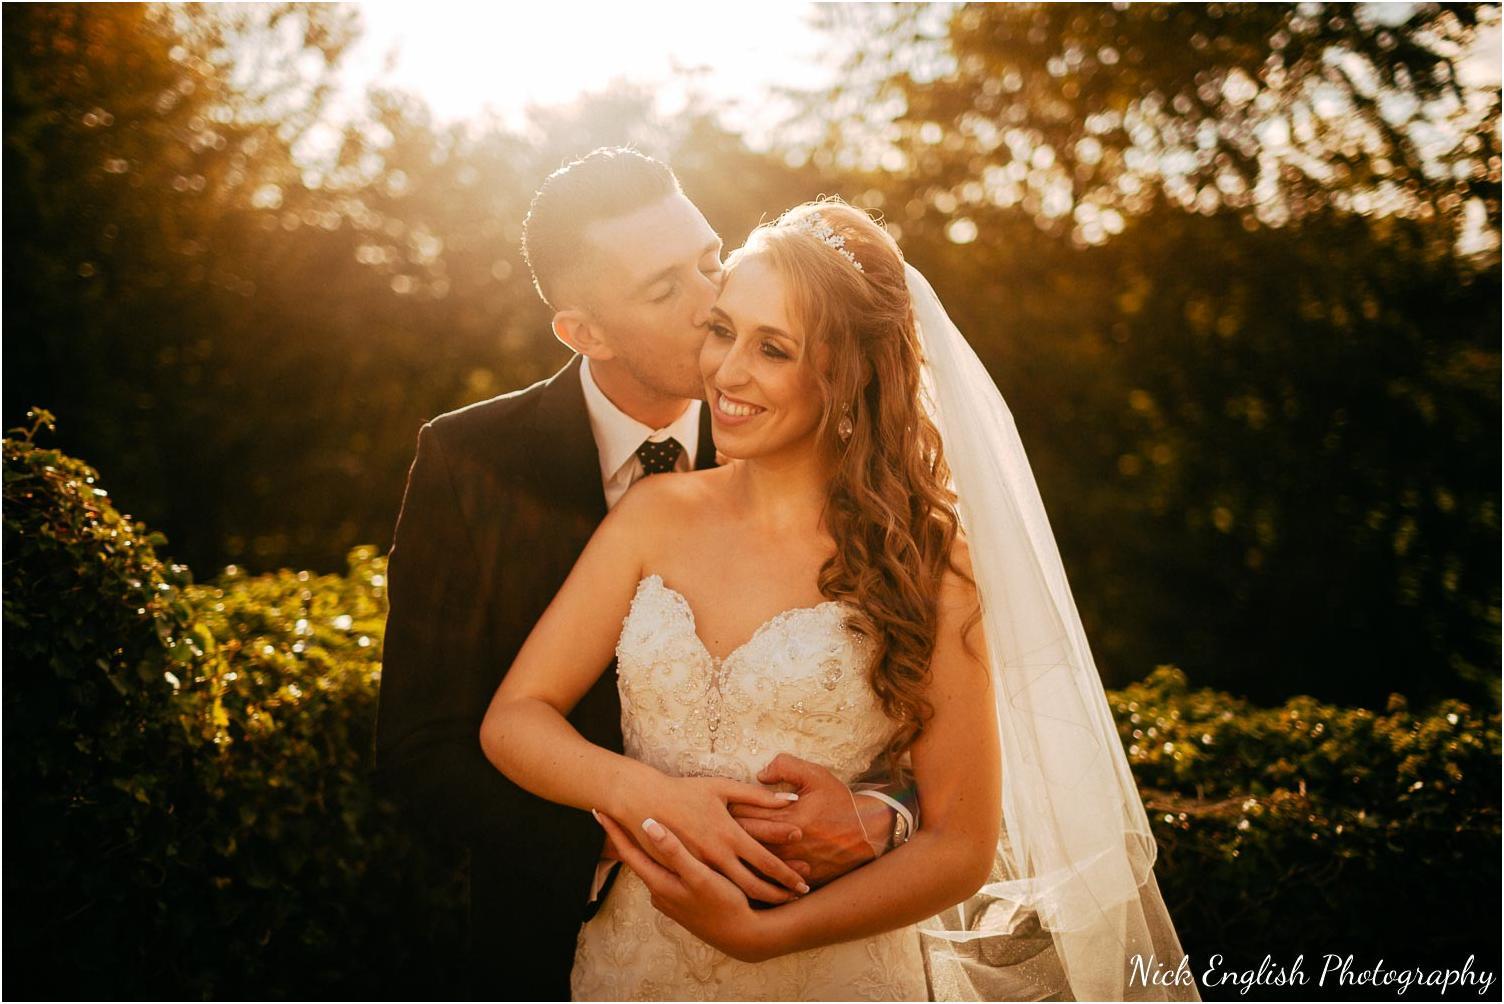 Lancashire_Wedding_Photographer-1-8.jpg